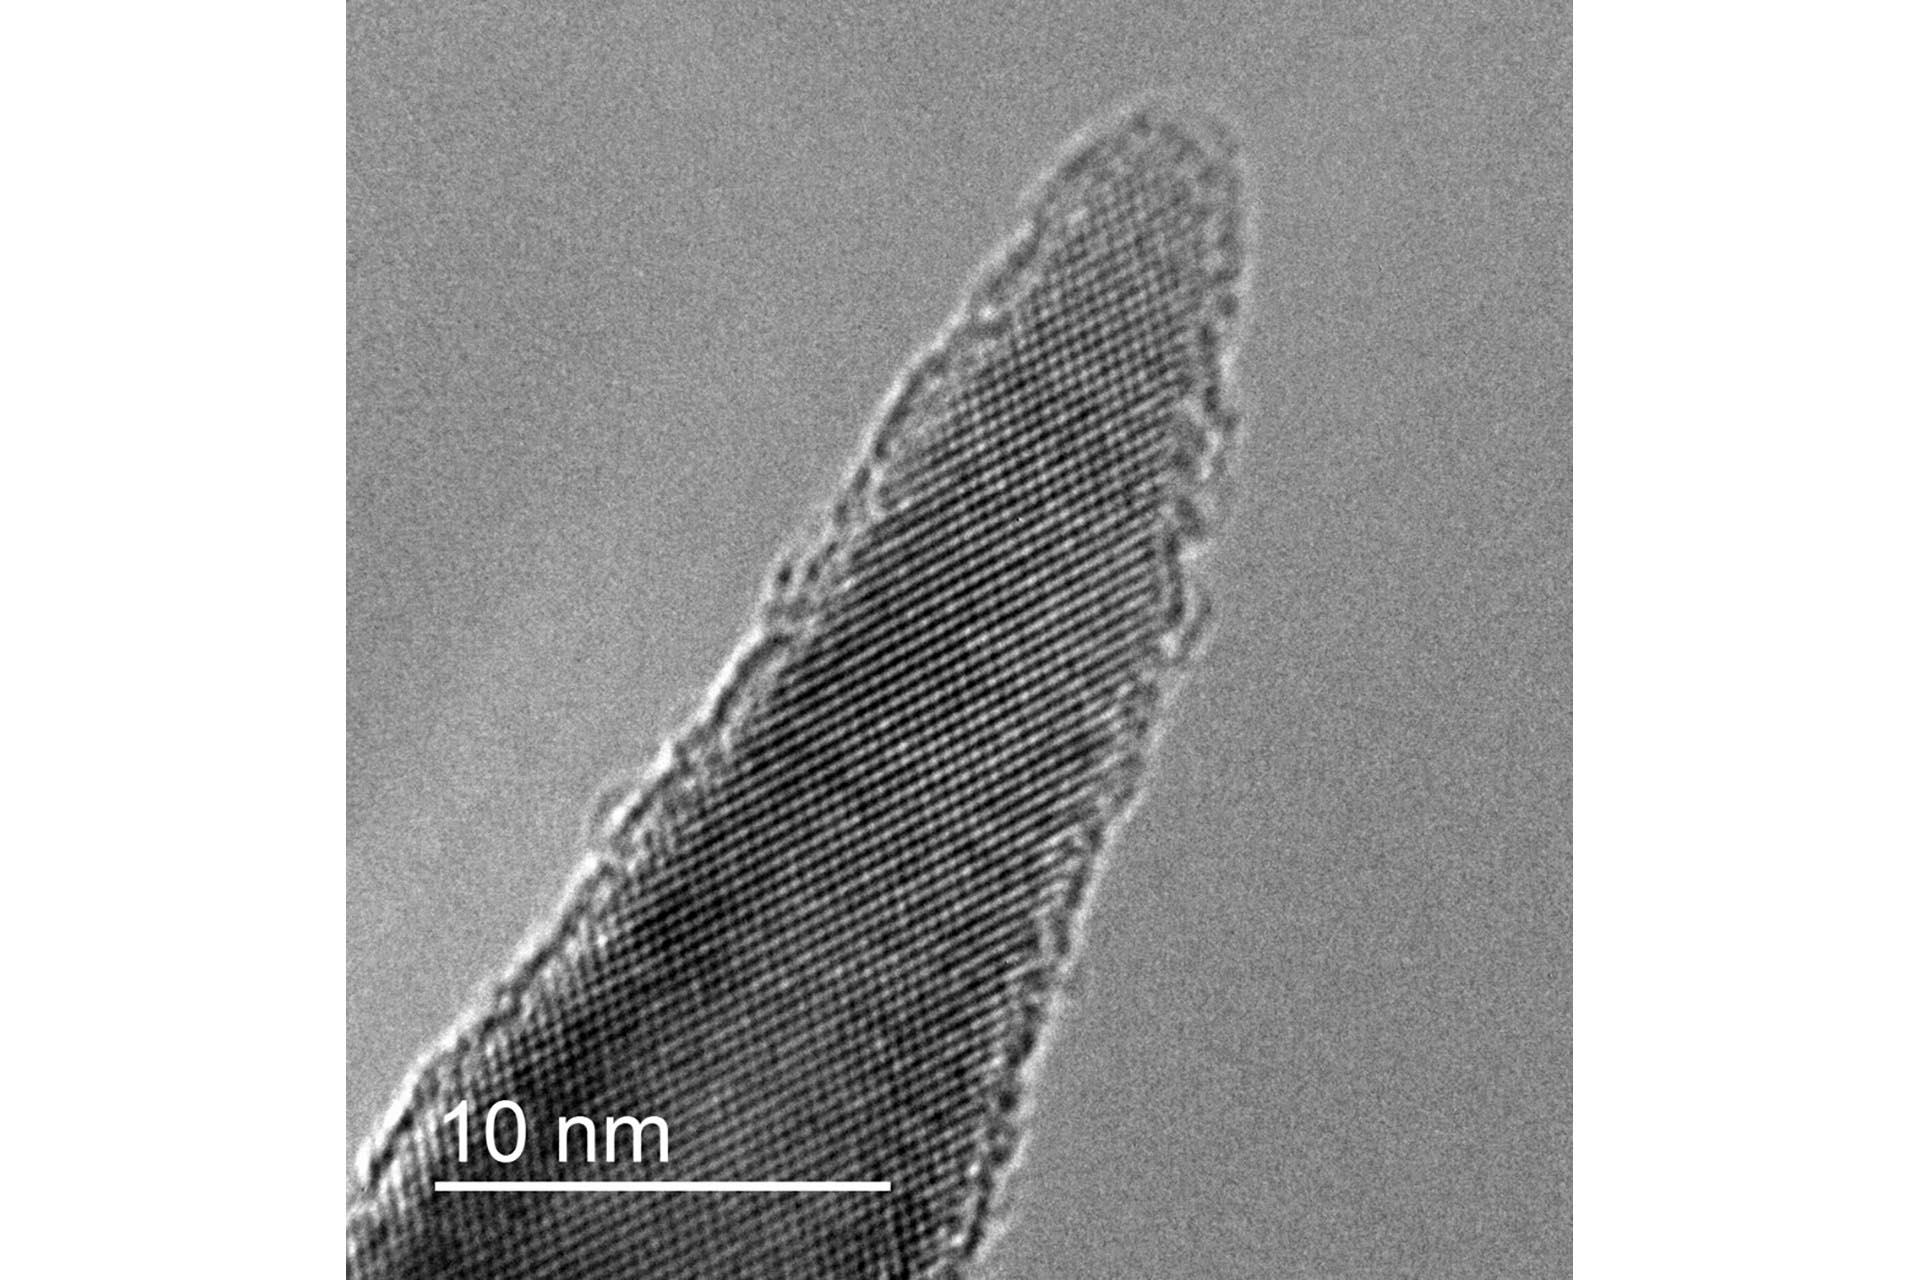 An atomic resolution transmission electron micrograph of a single NanoFrazor tip (Courtesy of Heidelberg Instruments Nano)